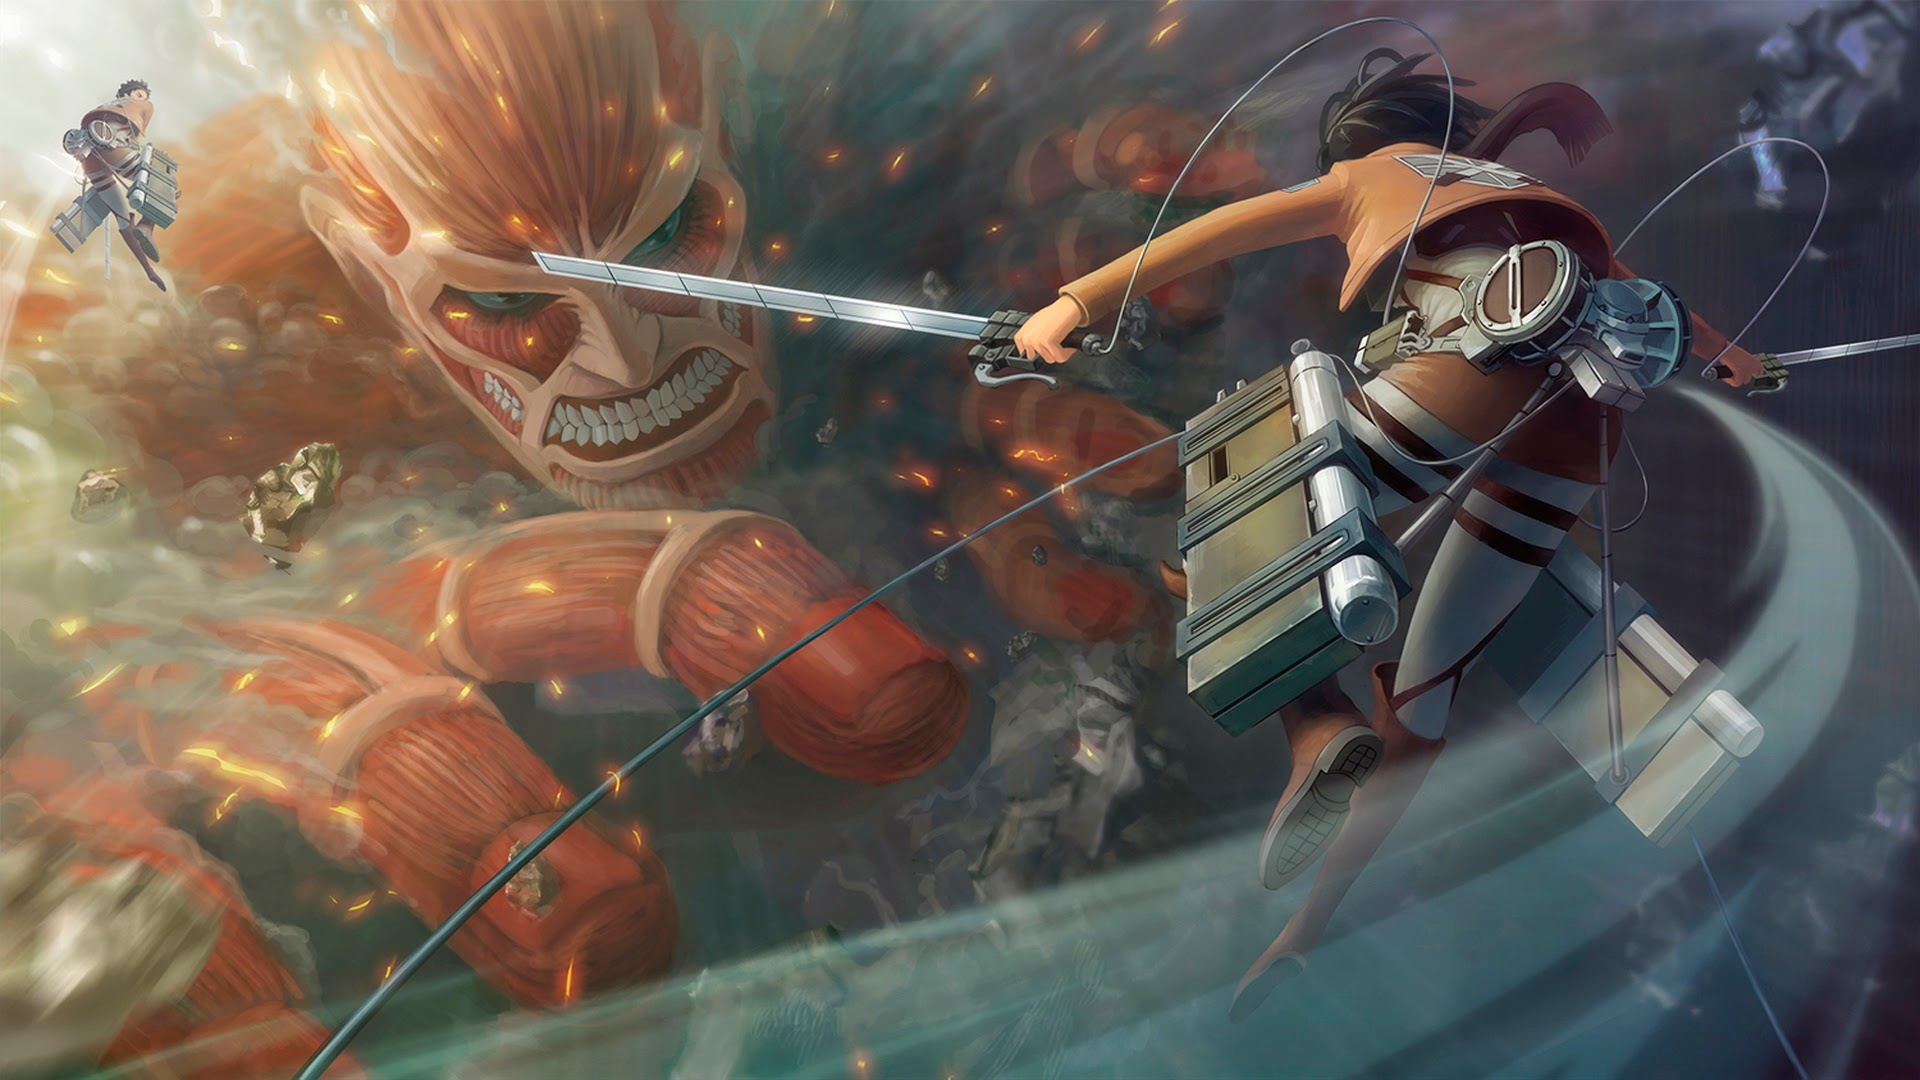 fighting titan attack on titan shingeki no kyojin anime hd wallpaper 1920x1080